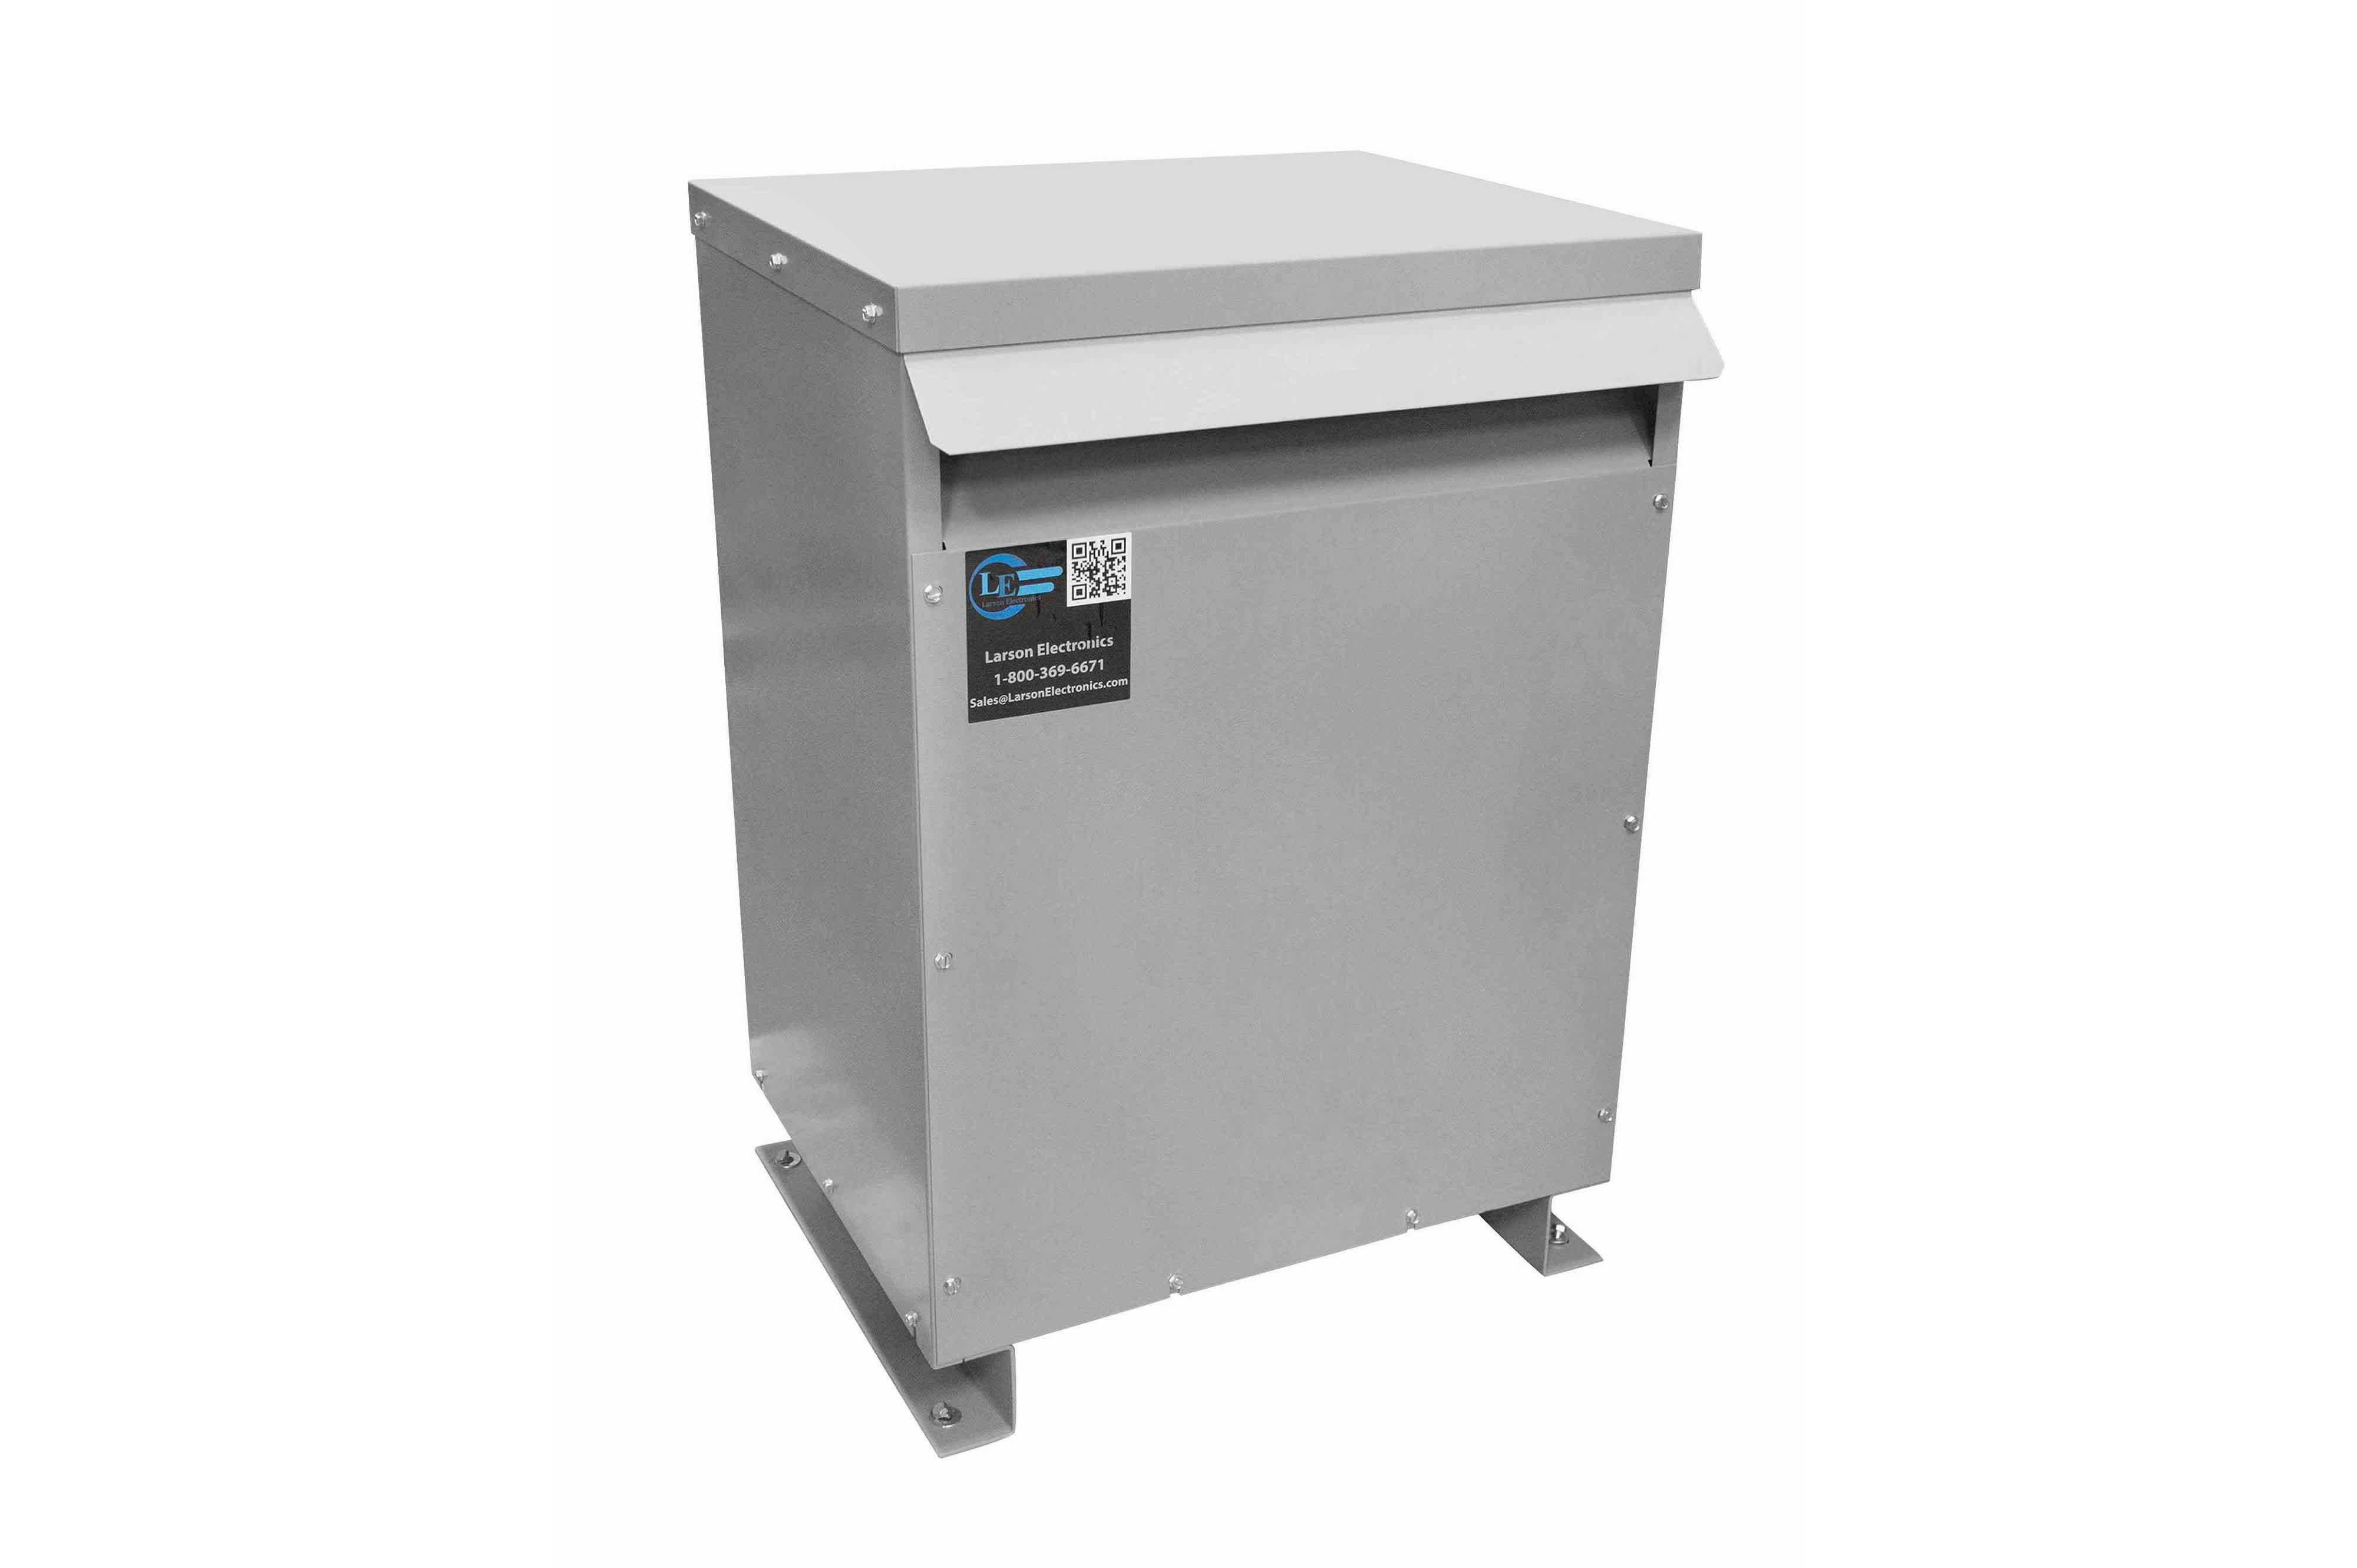 70 kVA 3PH Isolation Transformer, 480V Wye Primary, 480V Delta Secondary, N3R, Ventilated, 60 Hz